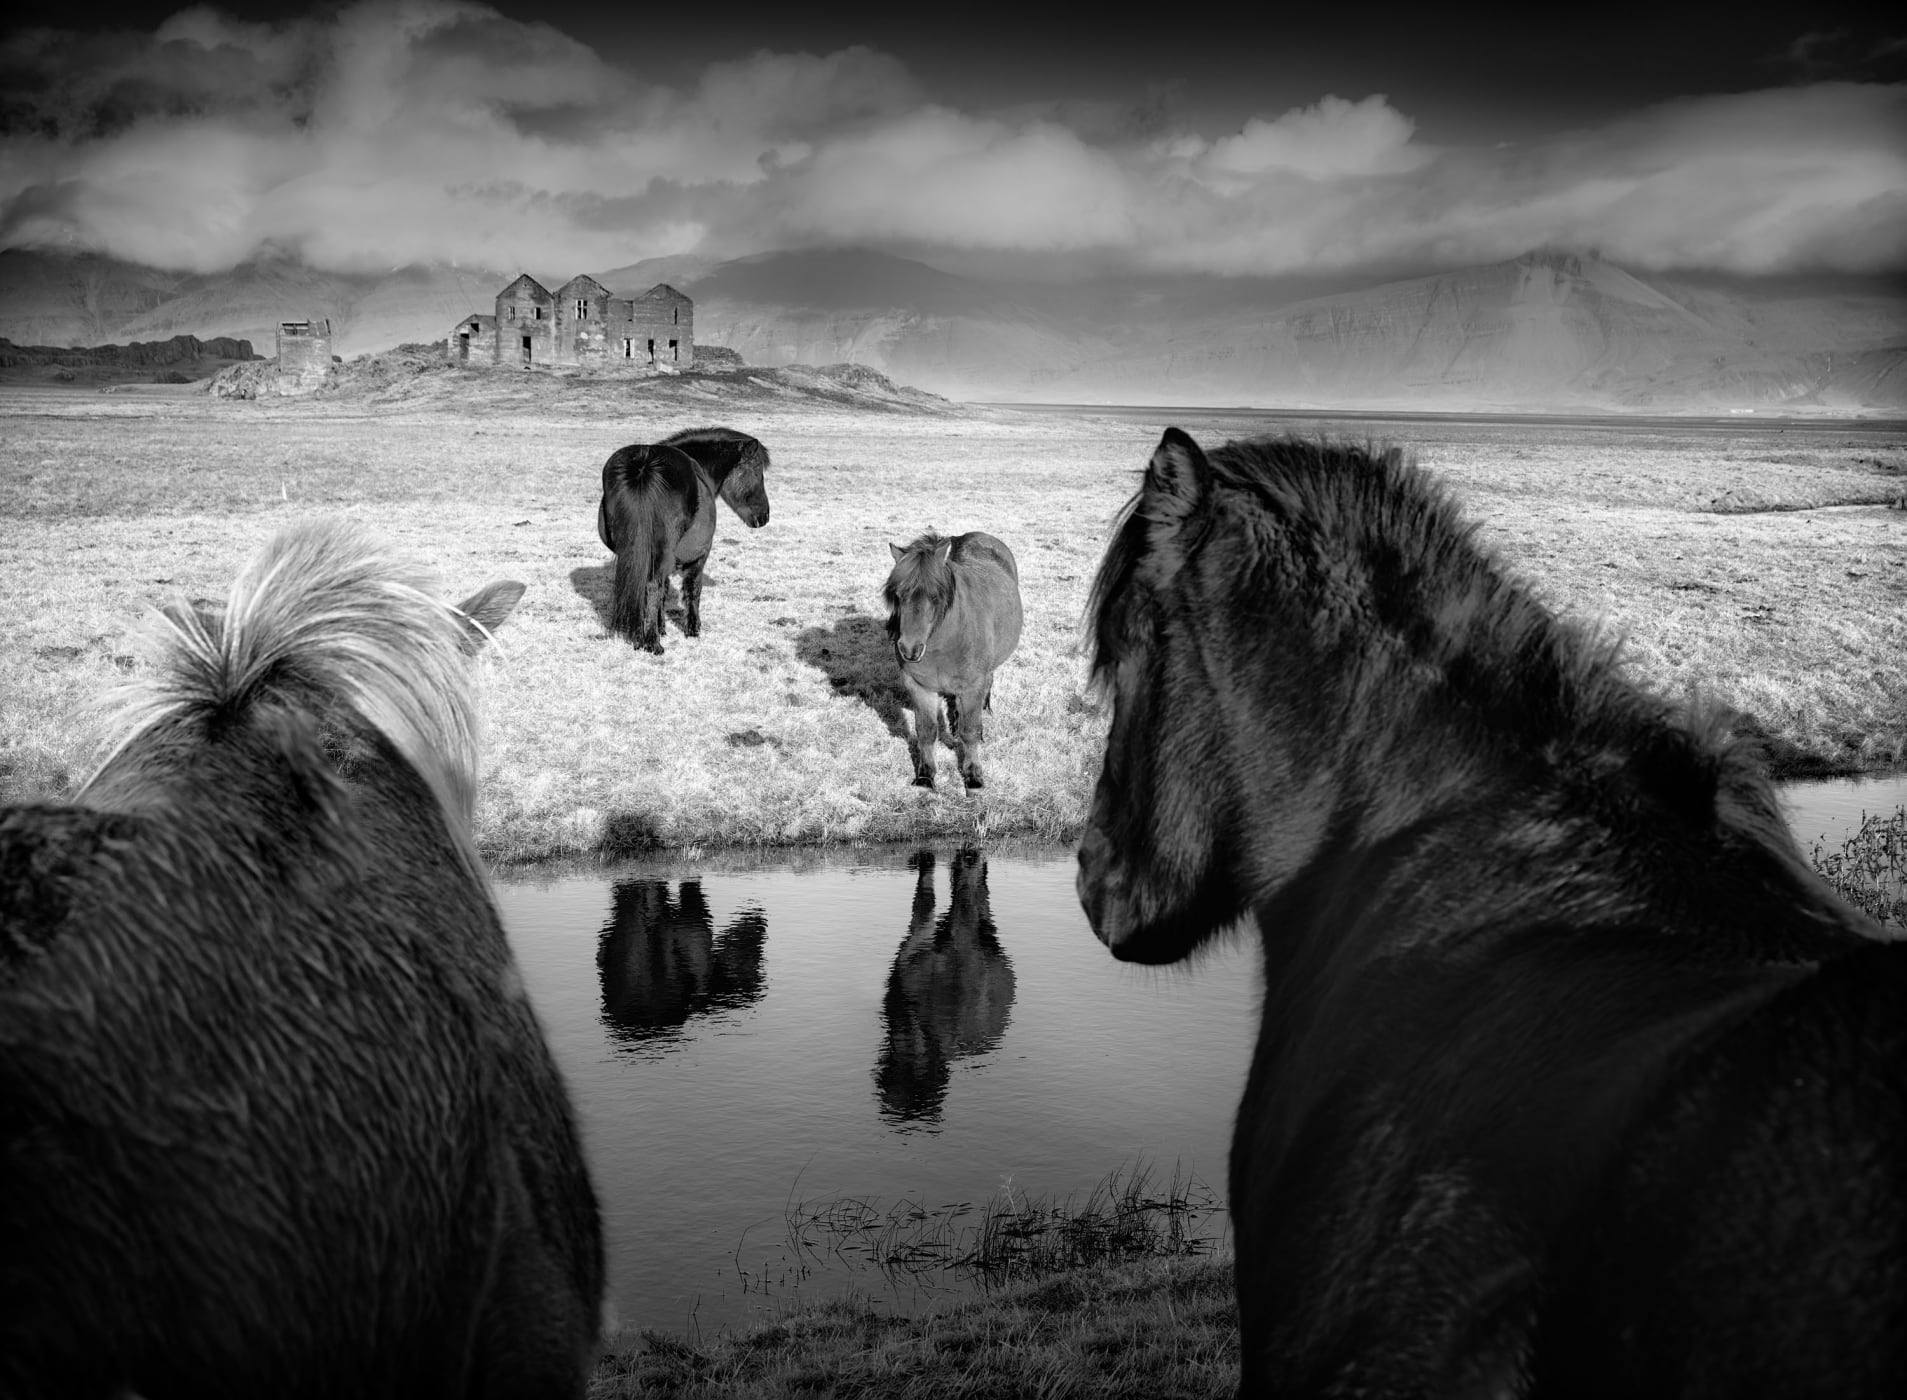 © Baerbel Brechtel, National Awards, Winner, Germany, 2019 Sony World Photography Awards